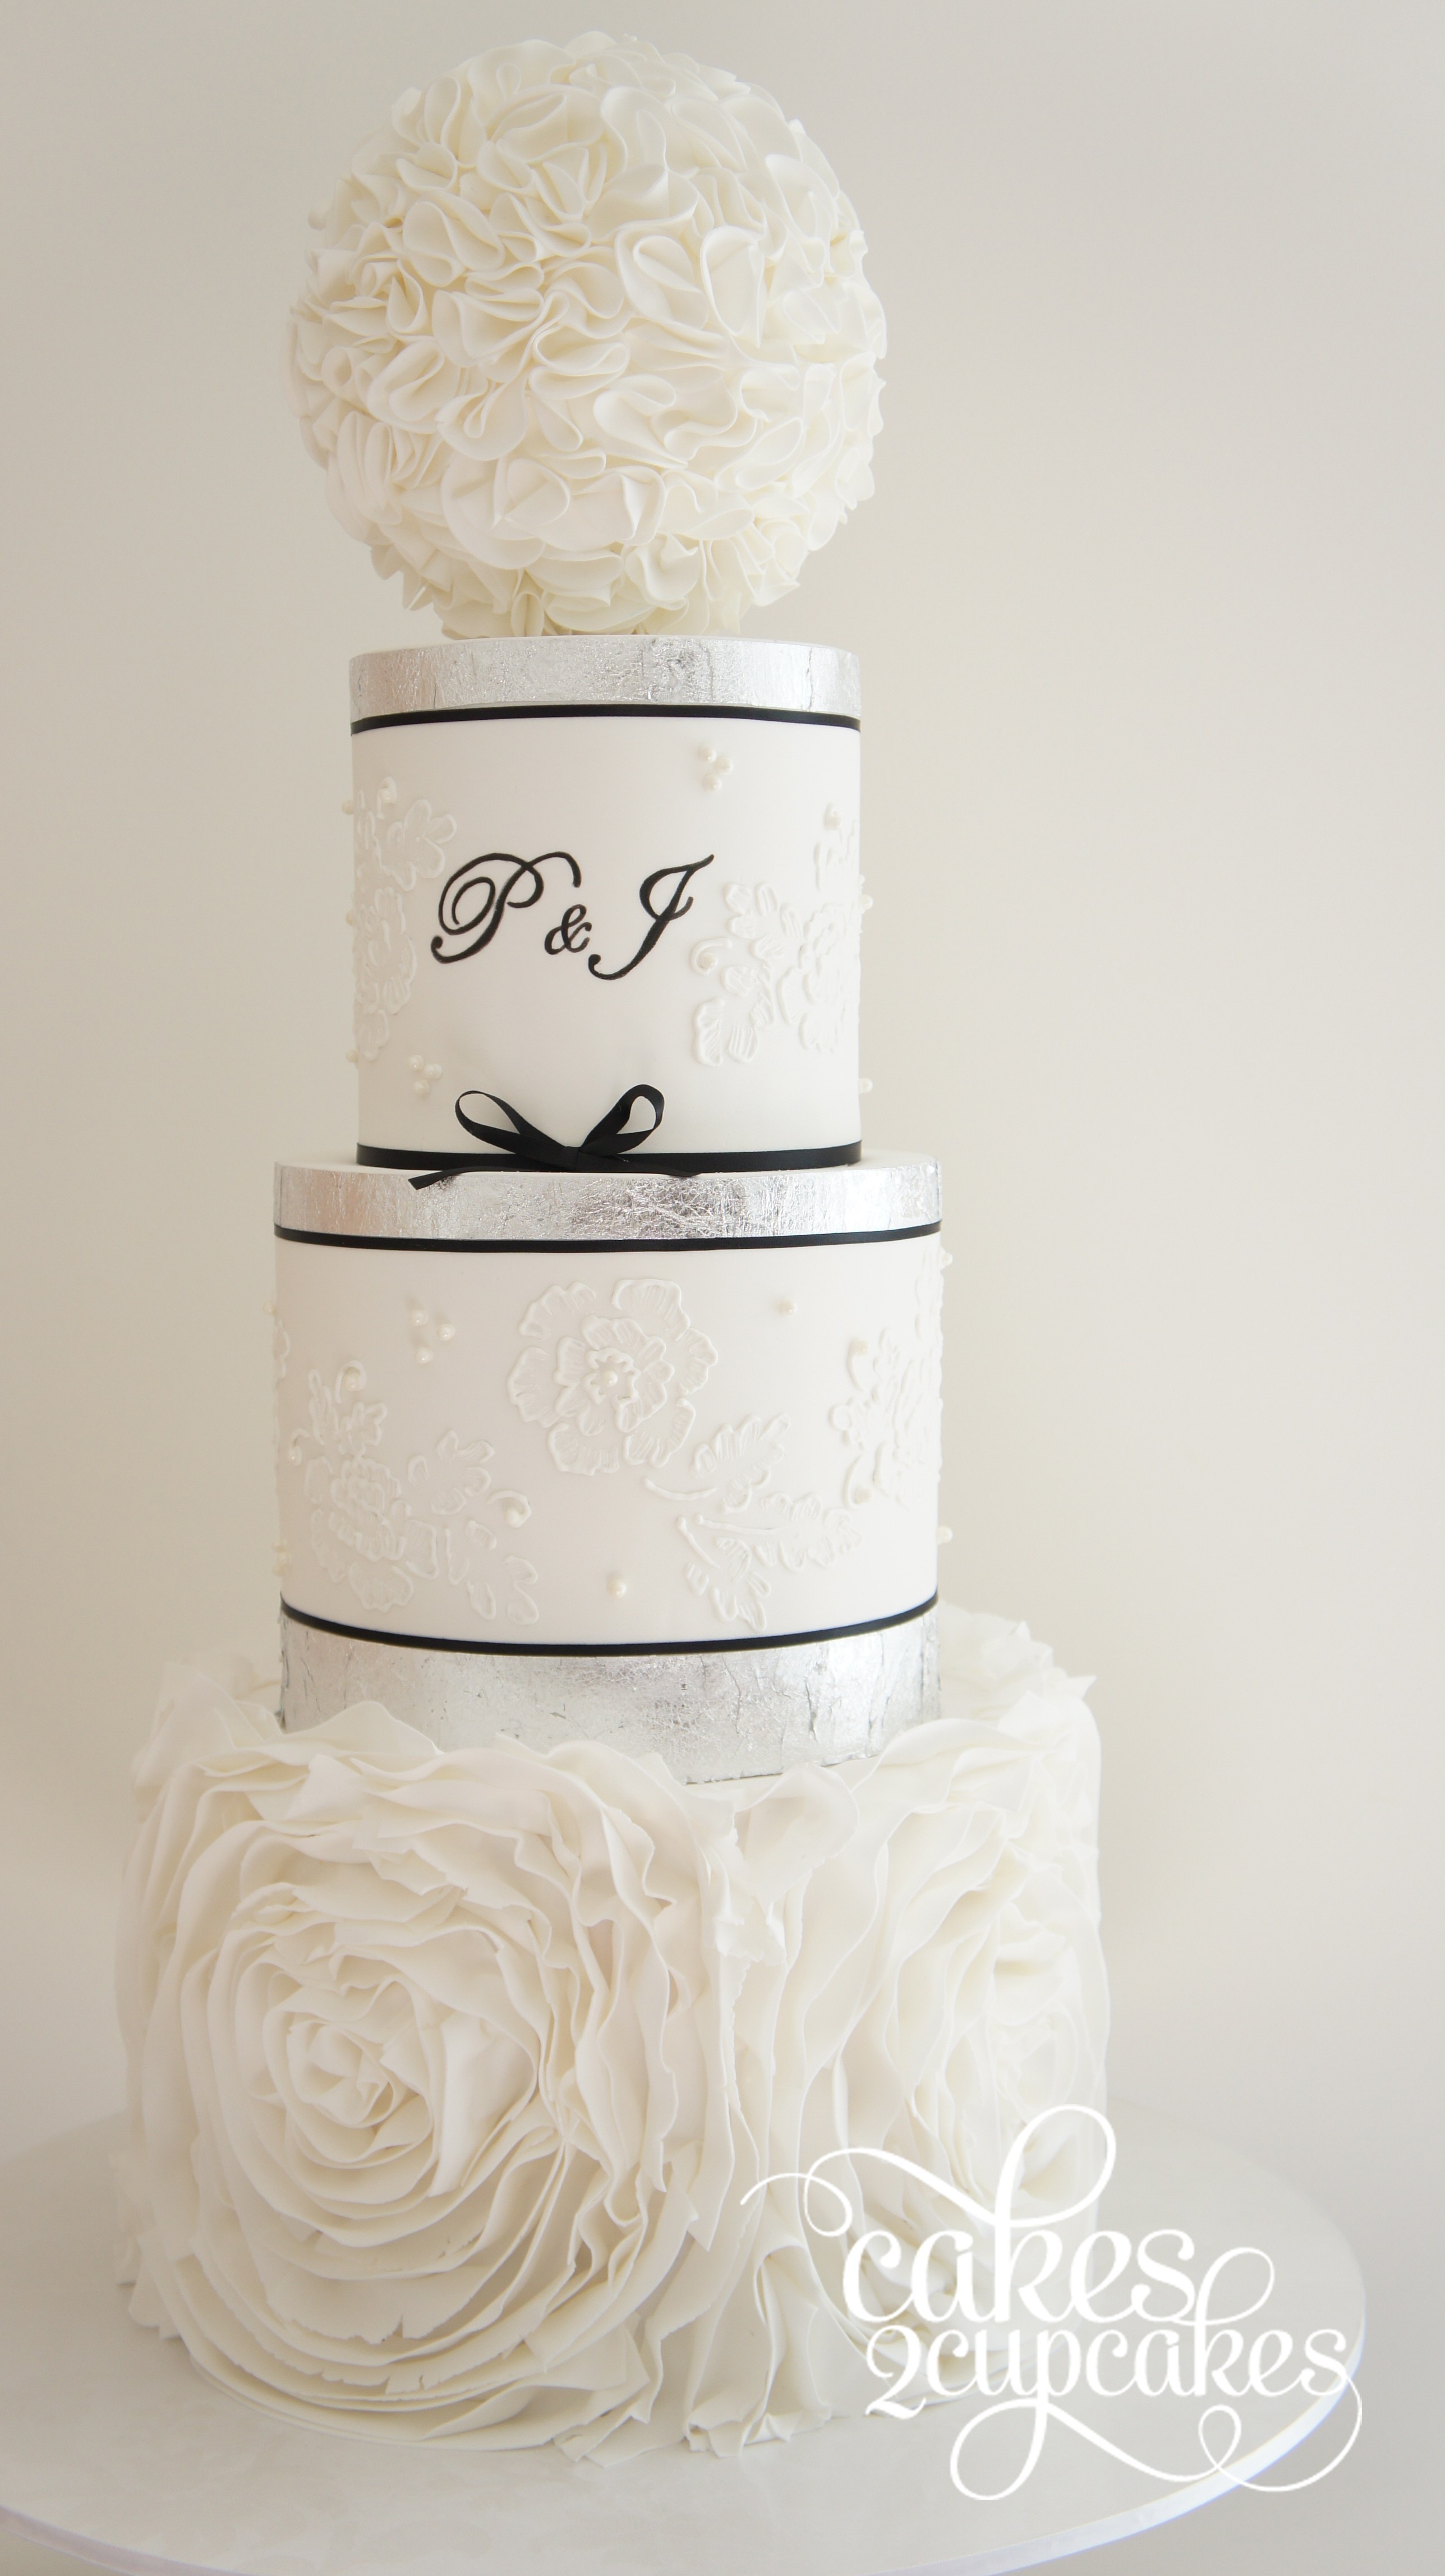 cakes2cupcakes-white-ruffle.jpg